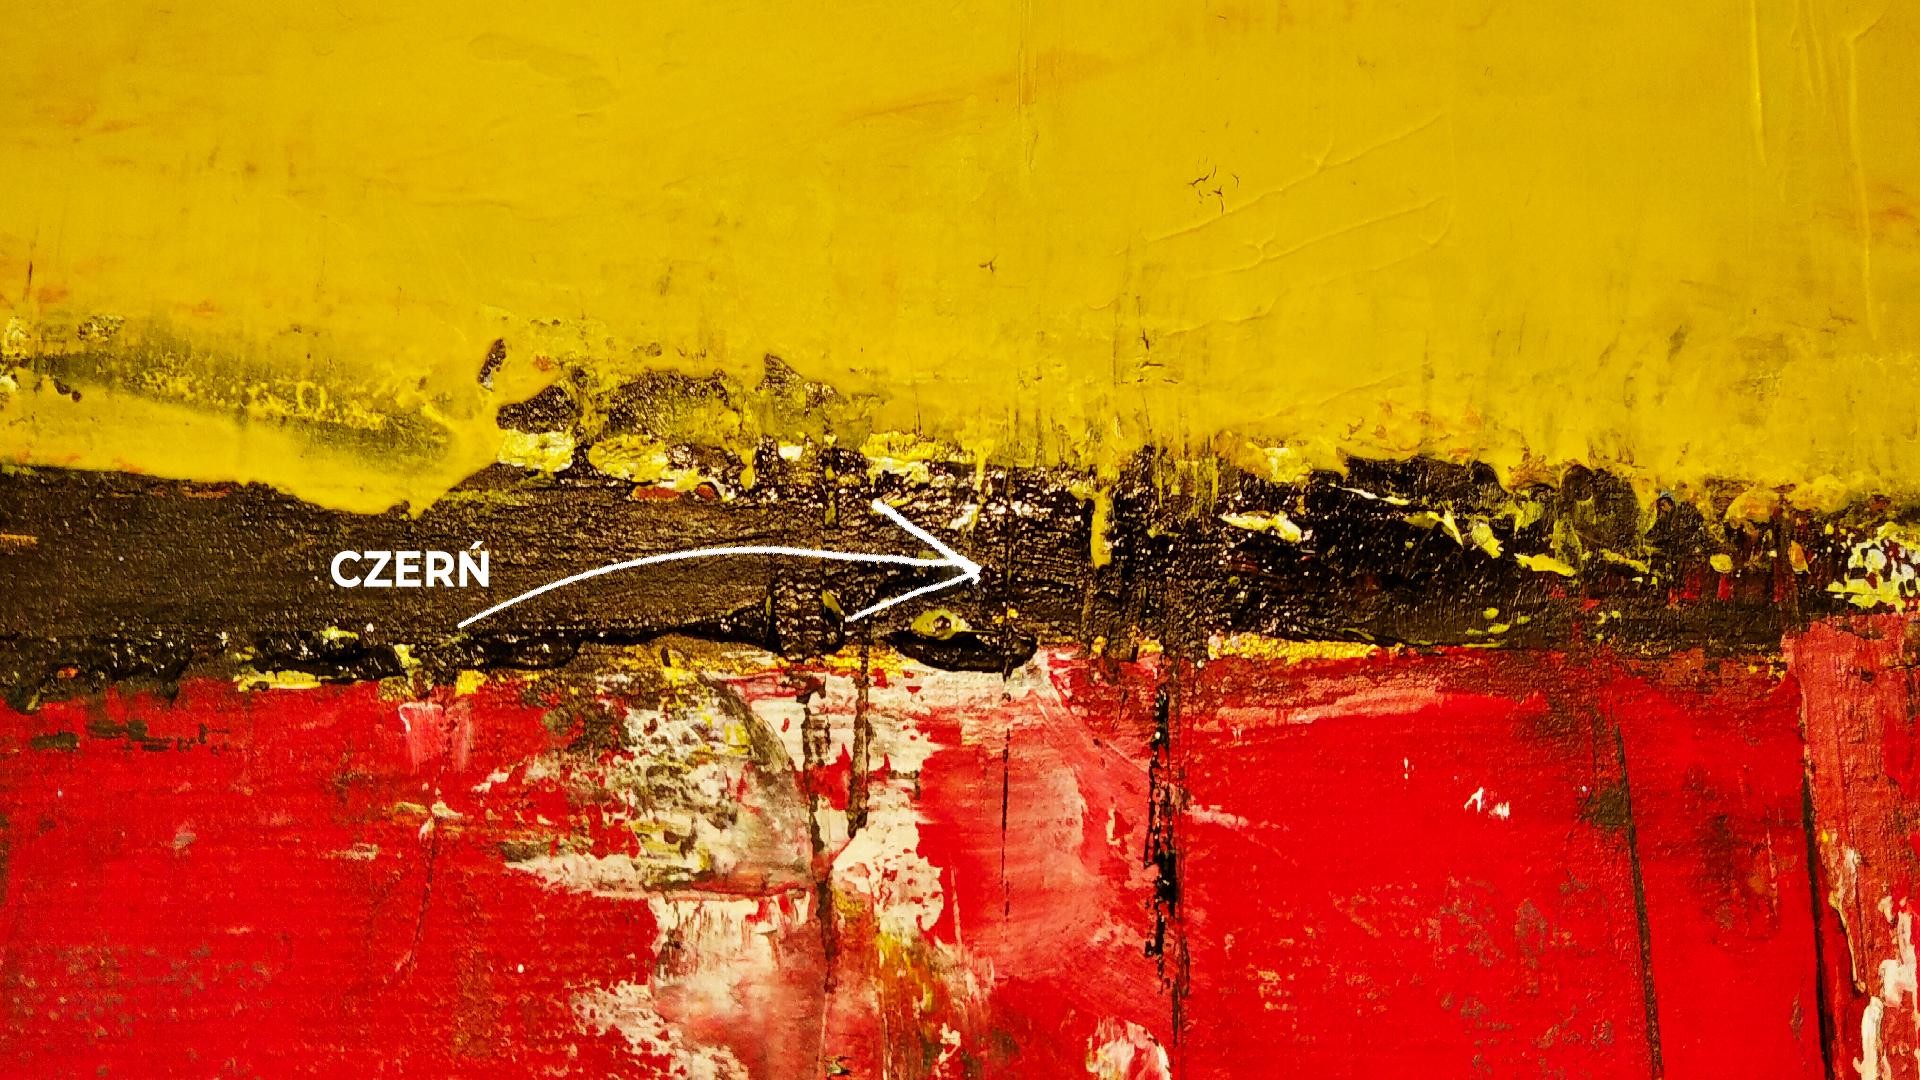 Obraz Akrylowy Brzeg Morski 60 x 80 cm detal